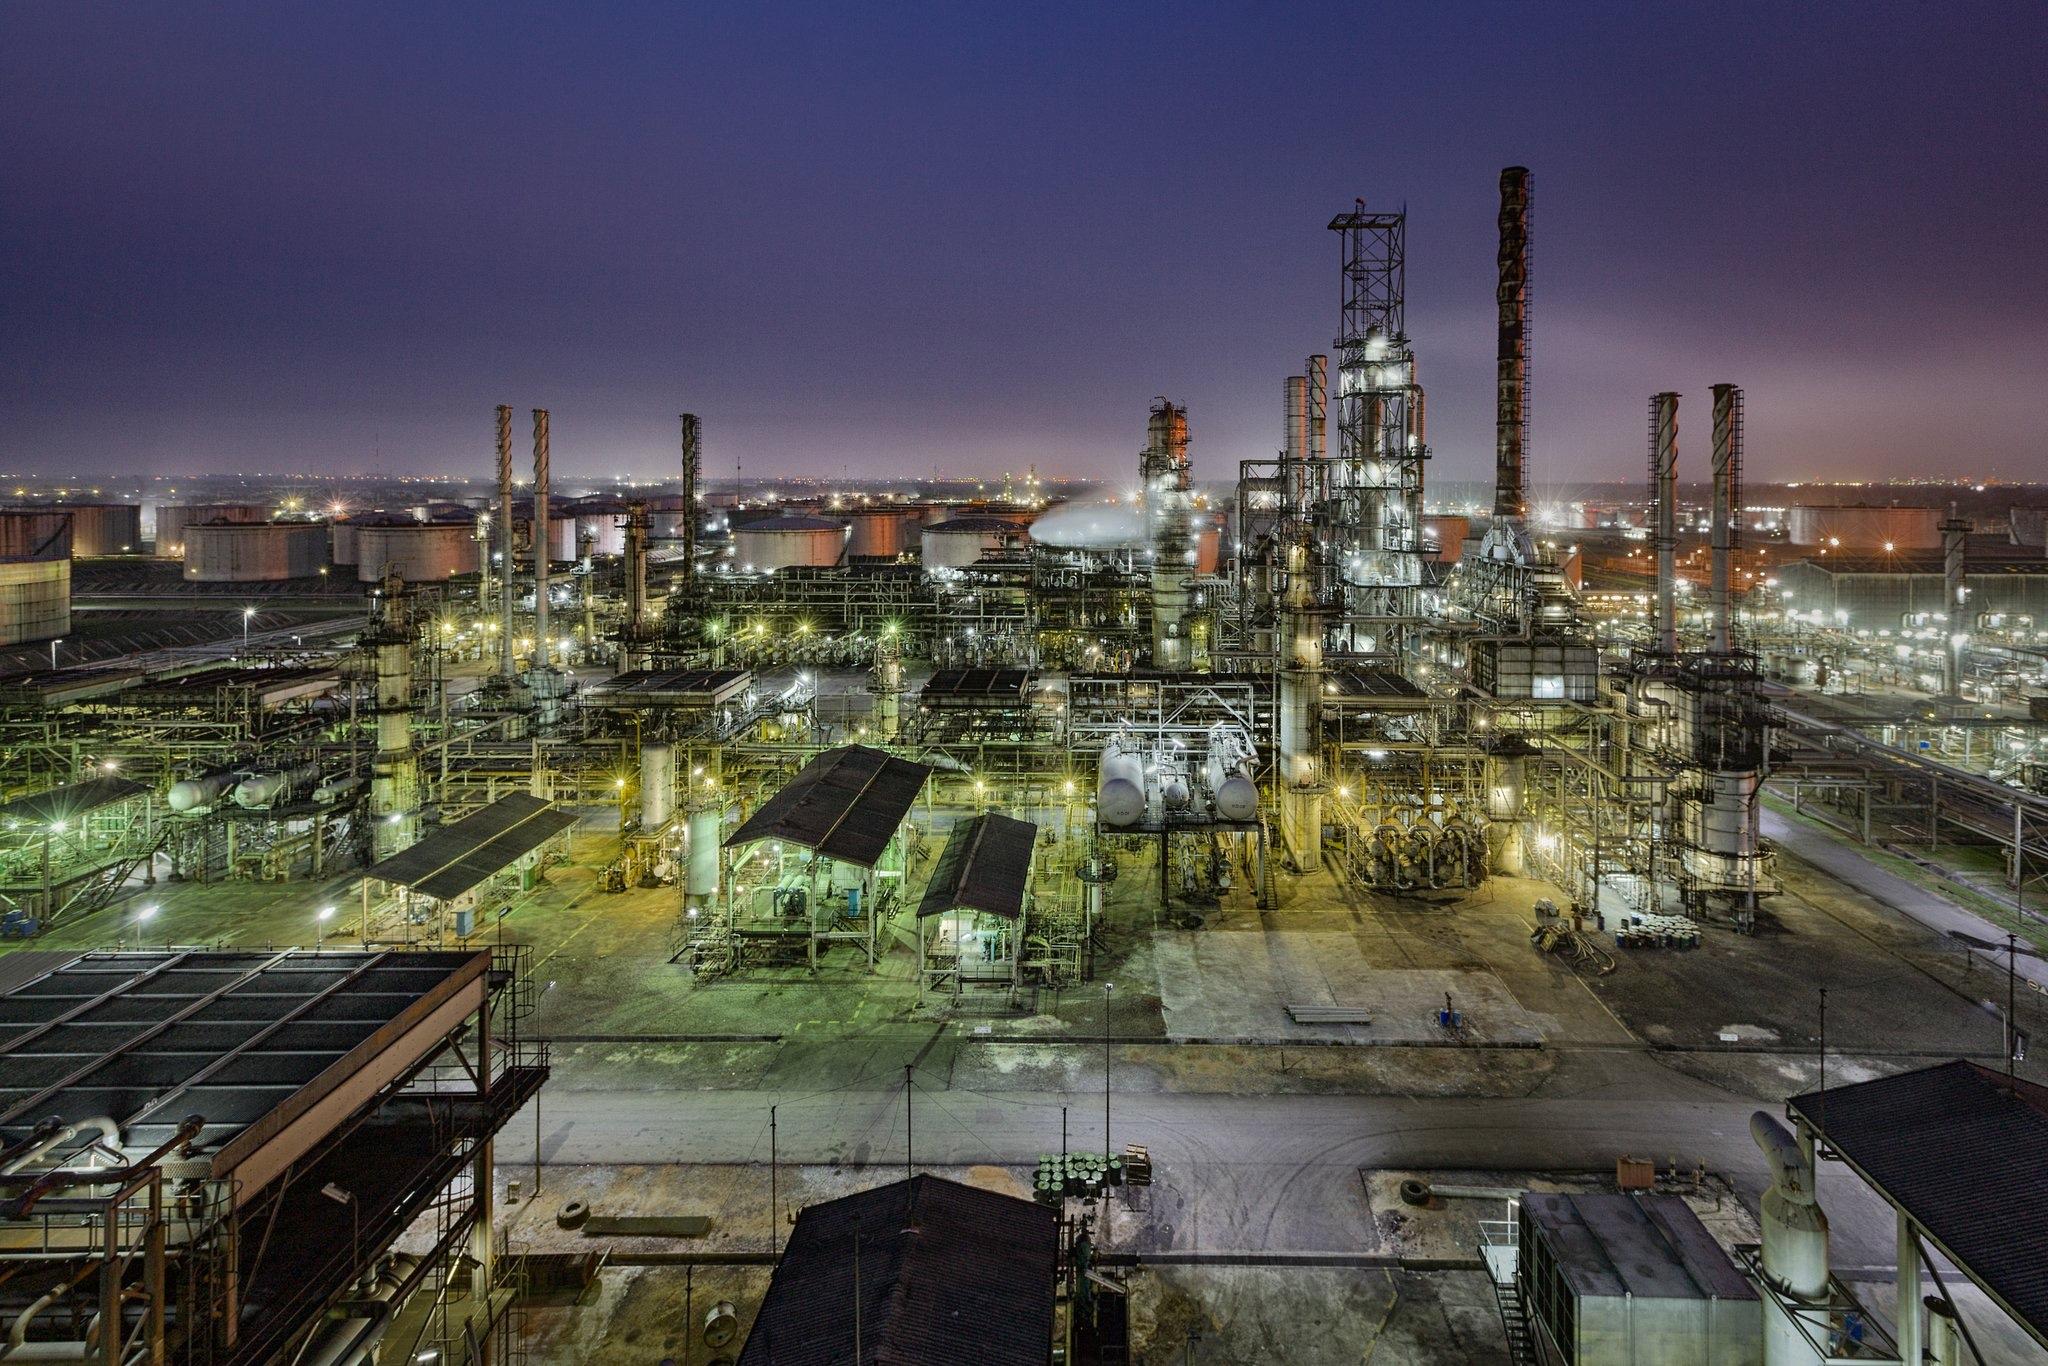 Port Harcourt Refinery Company